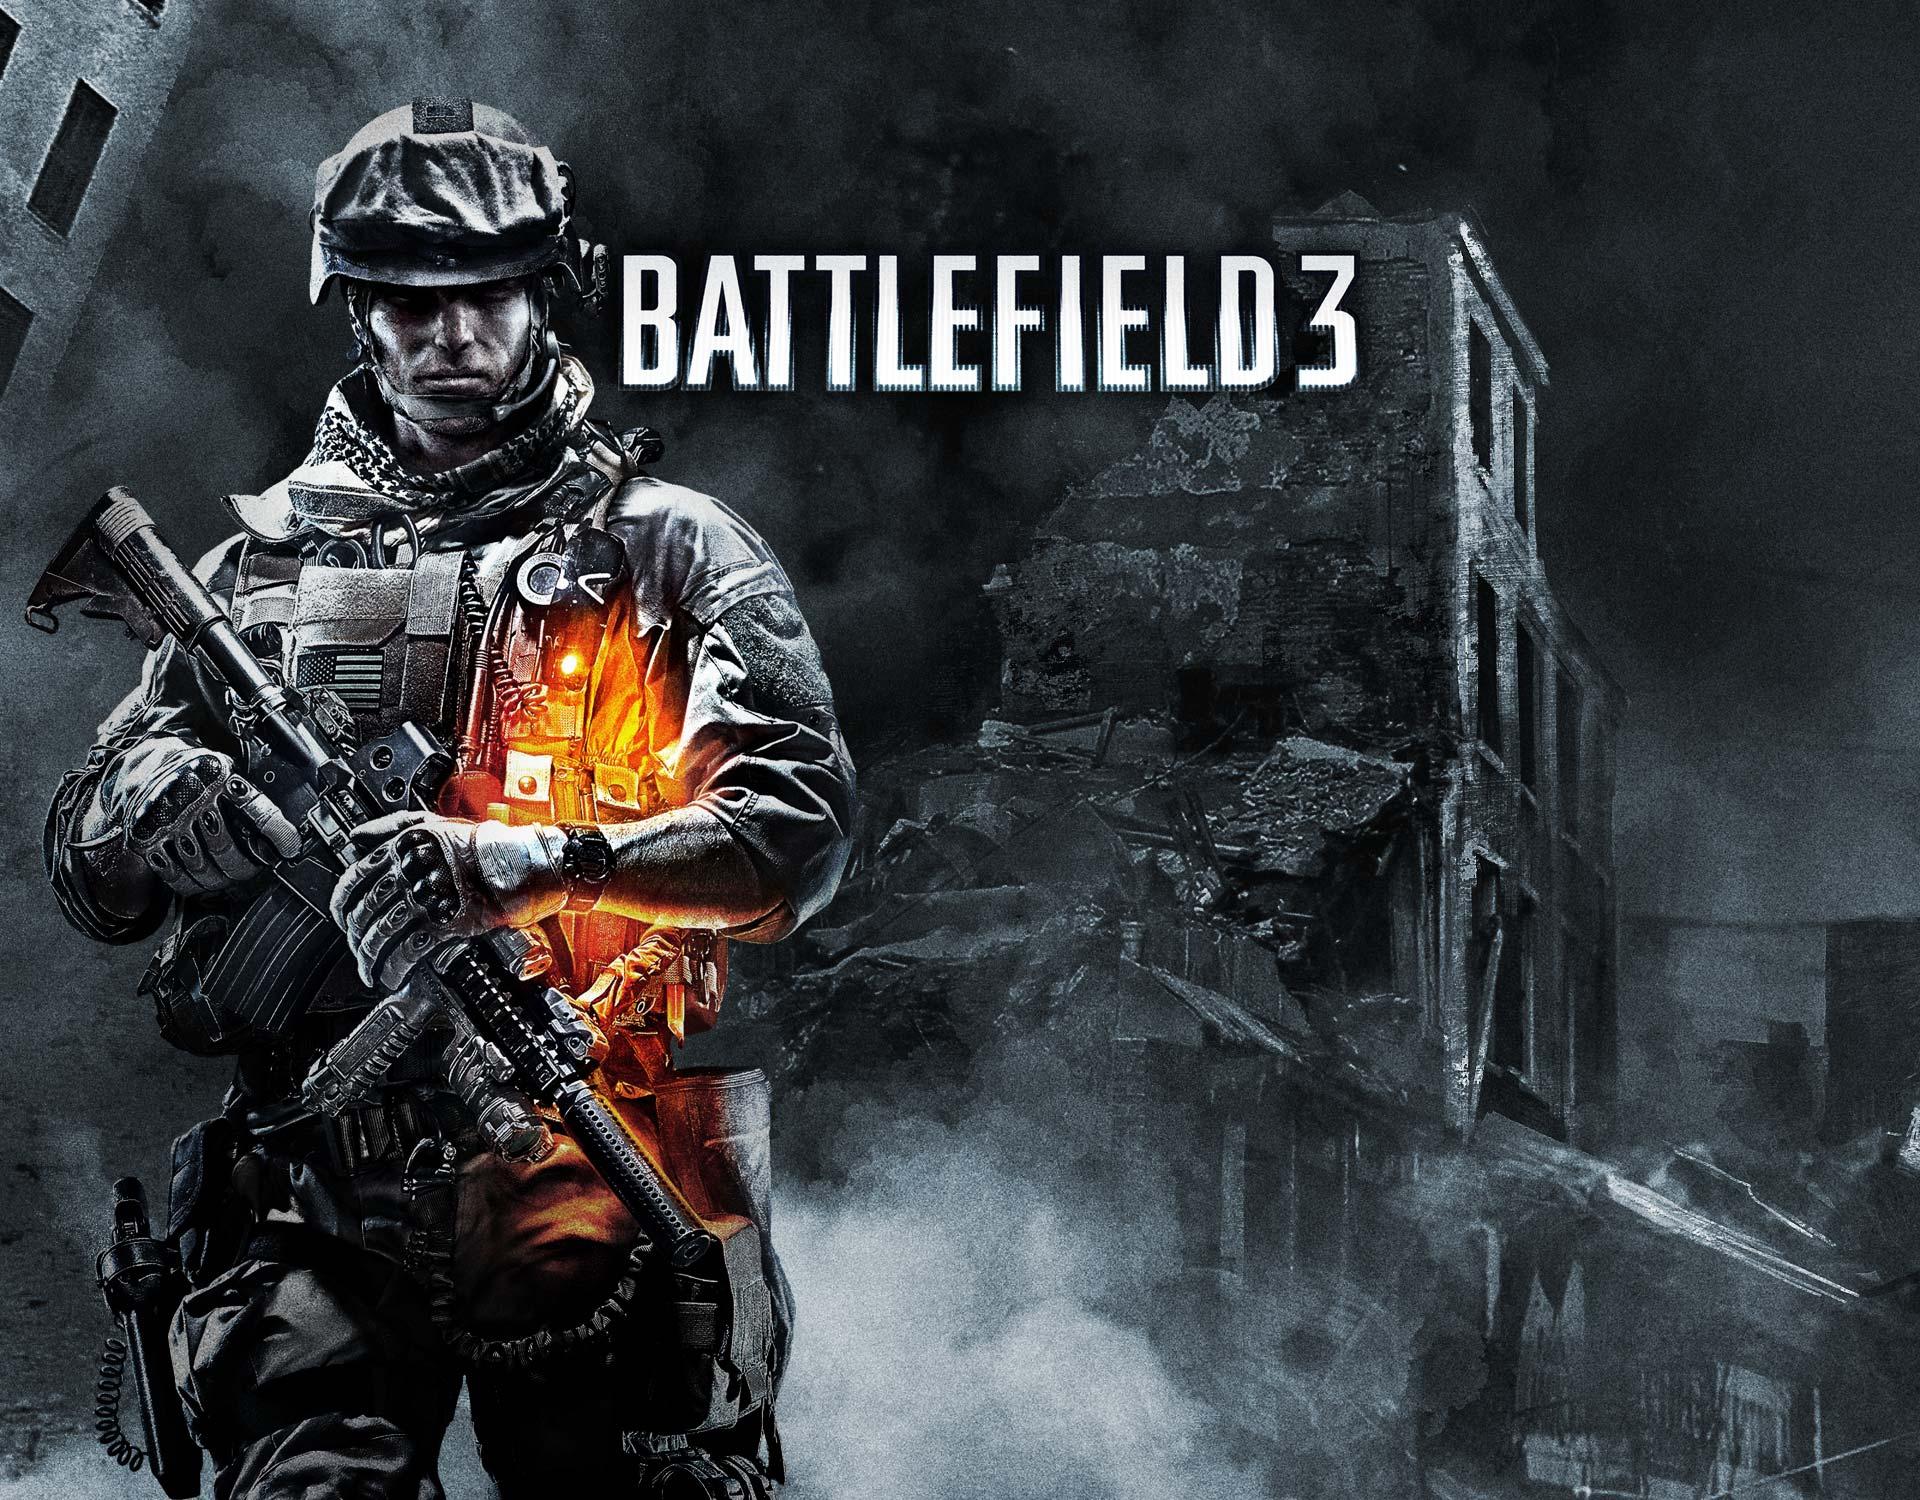 Battlefield 3 wallpaper 1